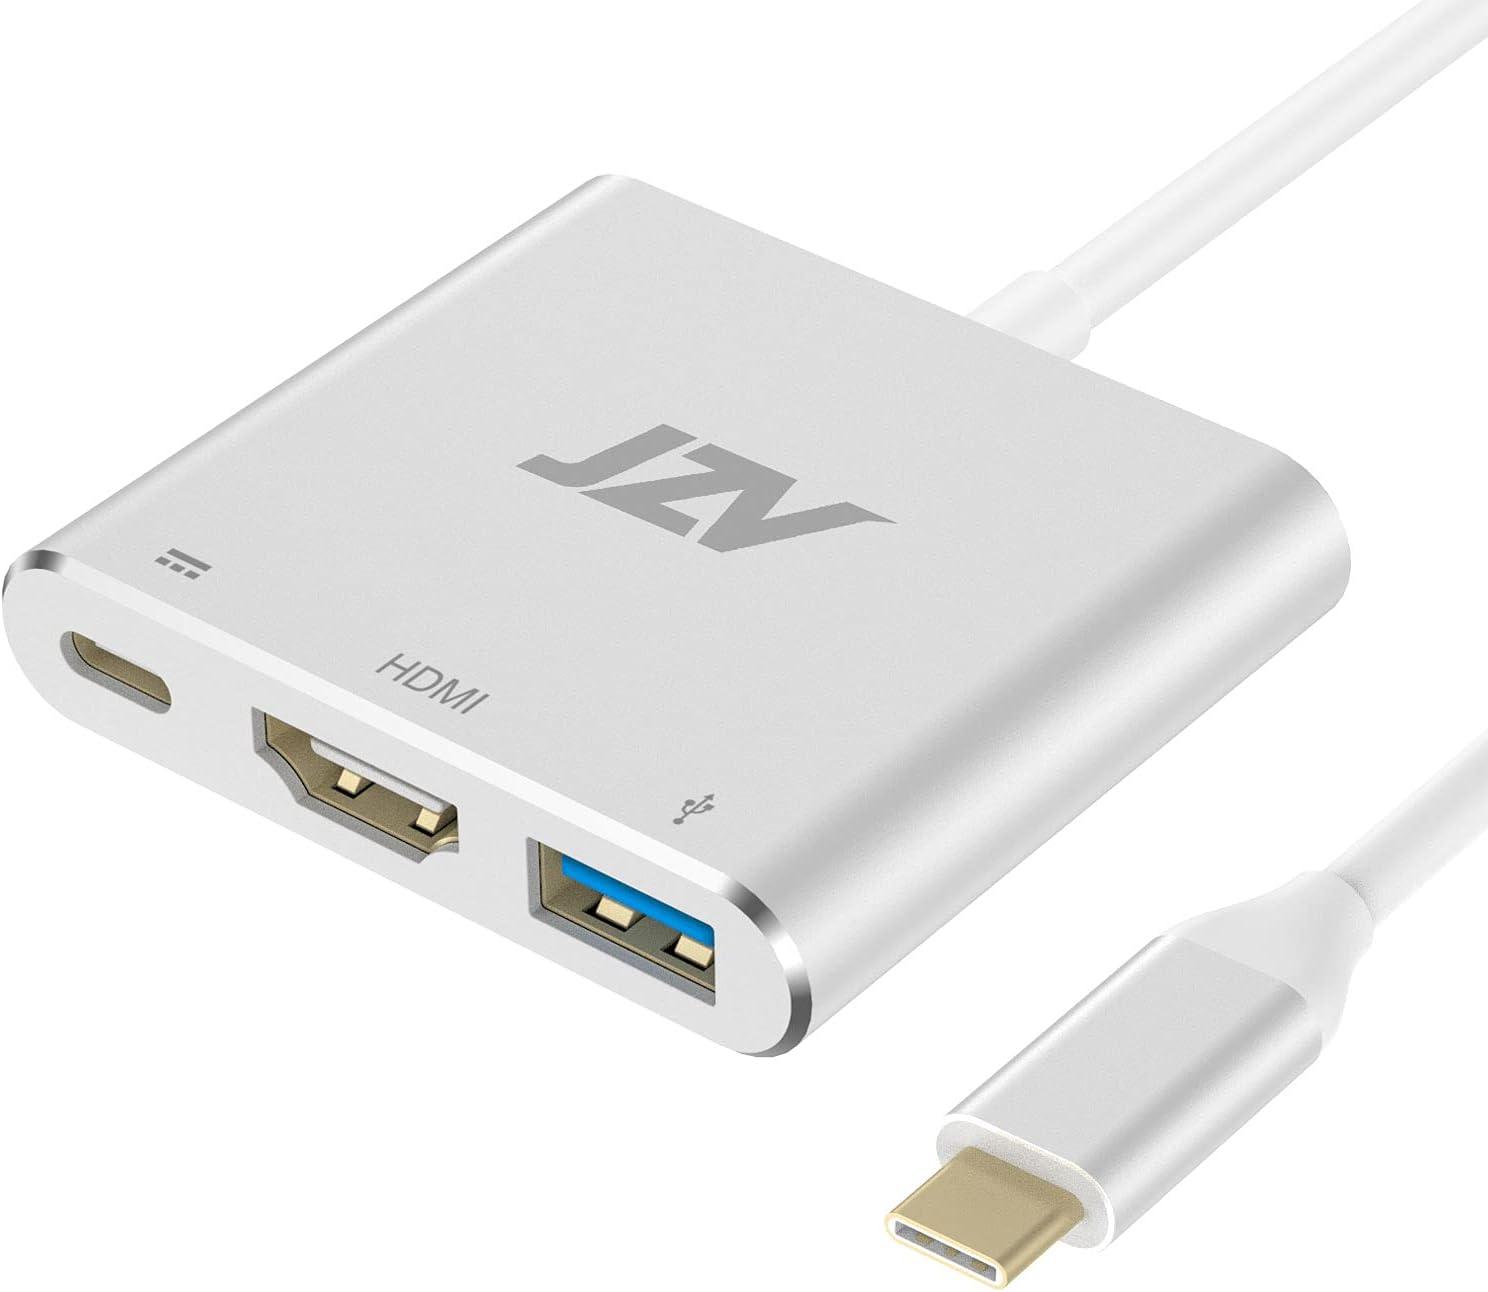 JZV HDMI to USB C,USB Type C HDMI Adapter MacBook pro Accessories USB C to HDMI Adapter with 4K HDMI USB 3.0 Port USB C Charging Port USBC hdmi Compatible for MacBook Pro MacBook Air iPad Pro